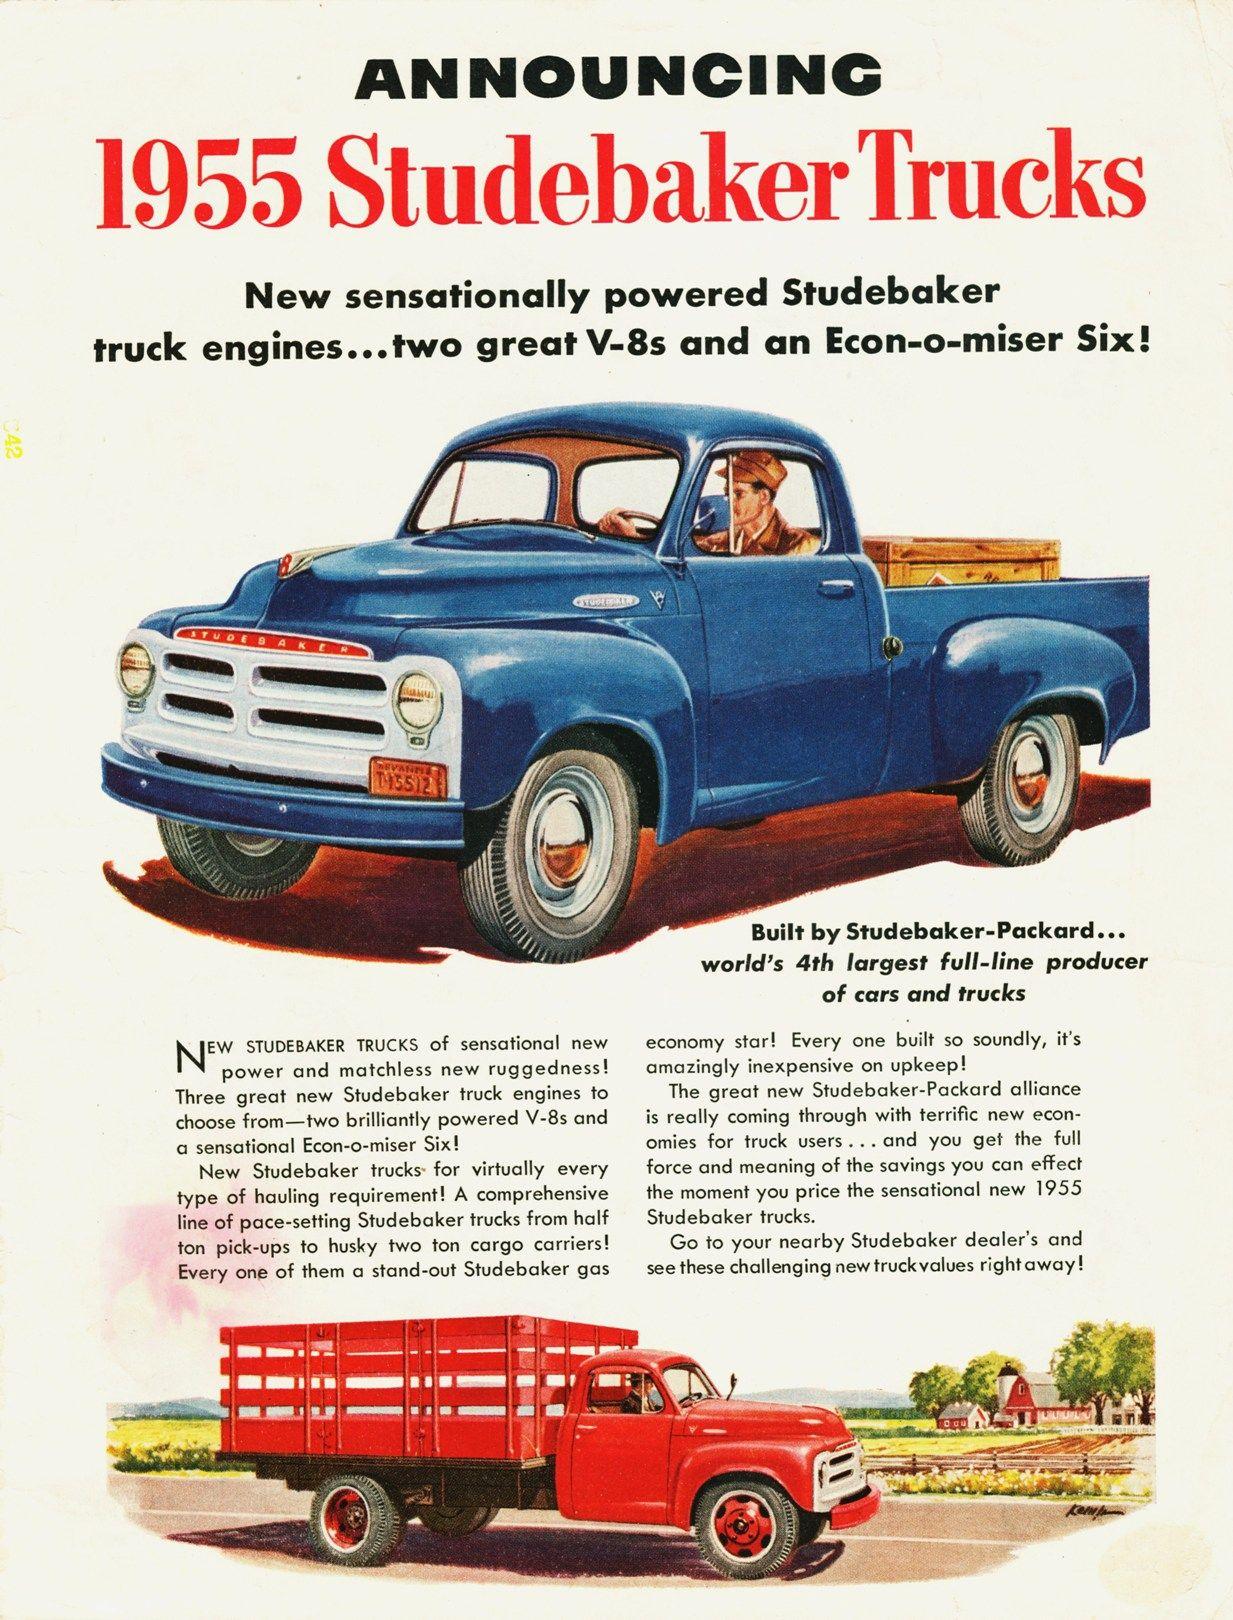 1955 Studebaker Truck Ad- | Studebaker - Packard | Pinterest | Ads ...